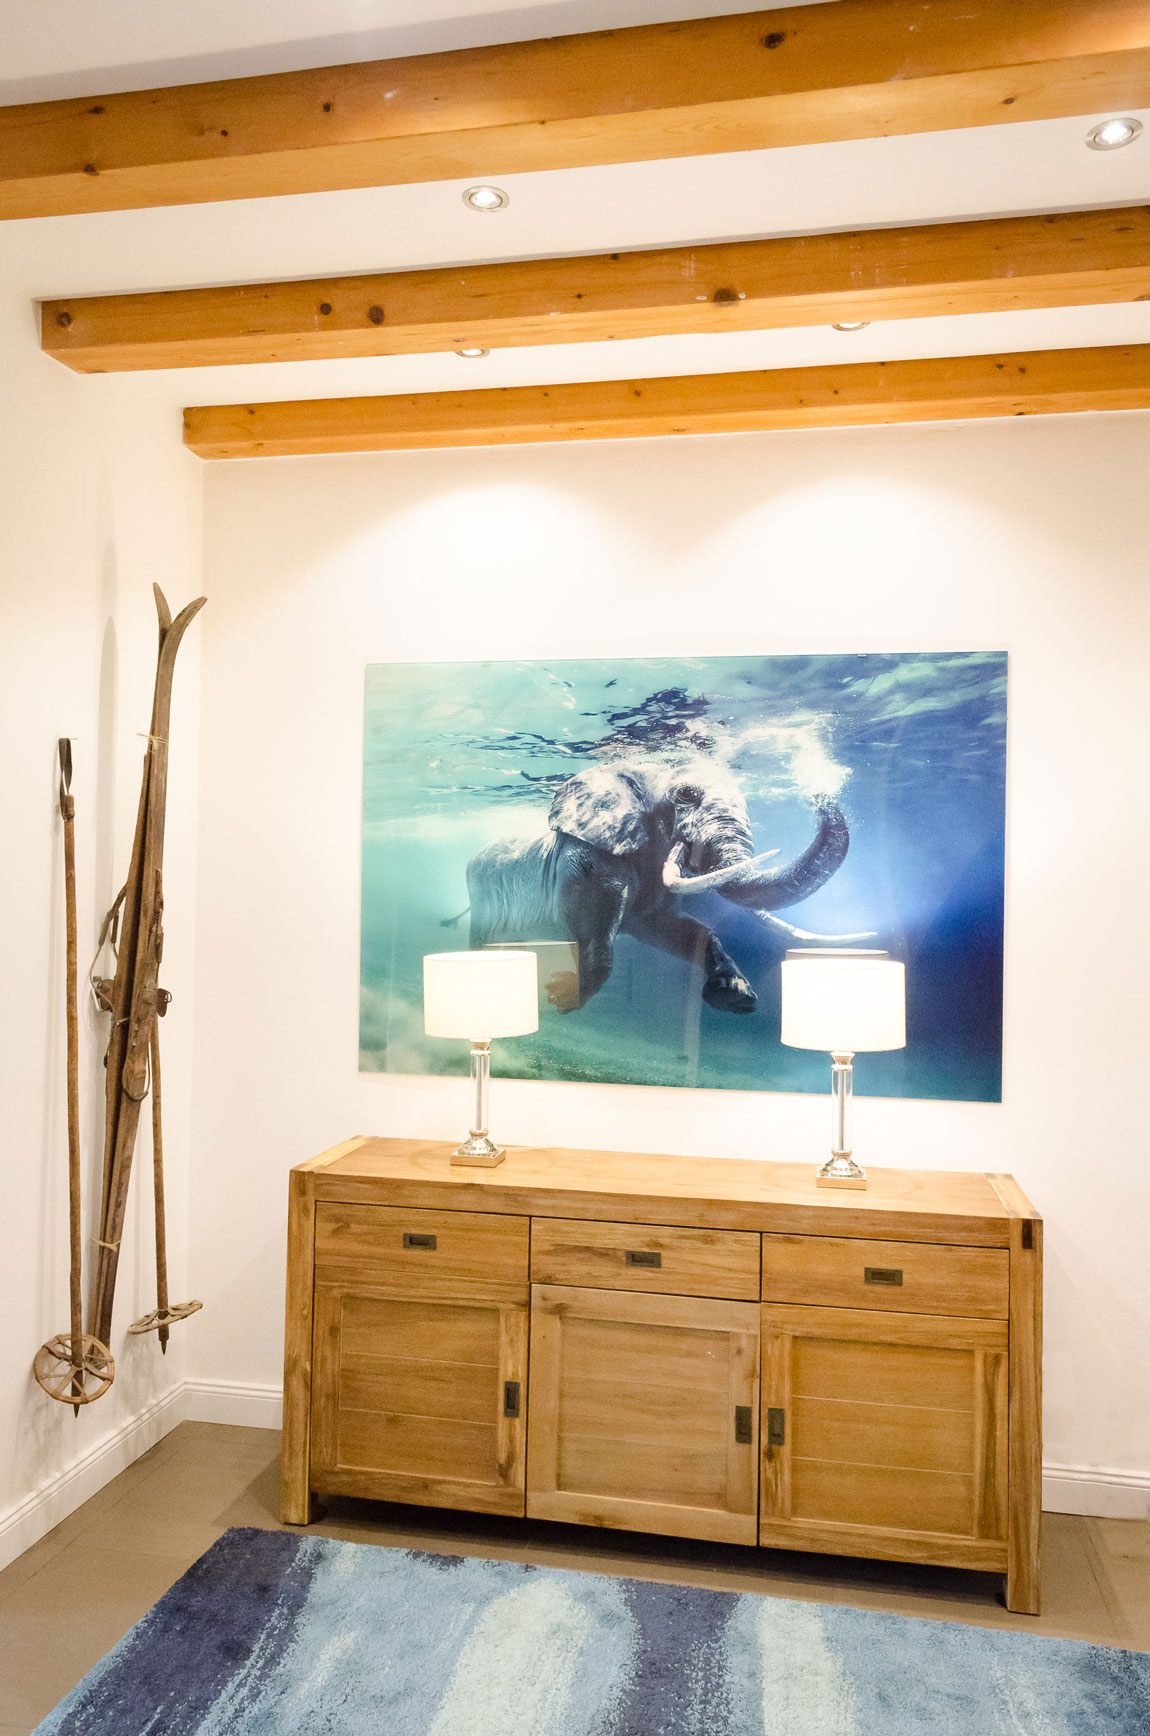 Sara Röhl Interior Design - Lebensräume mit Stil und Funktionalität